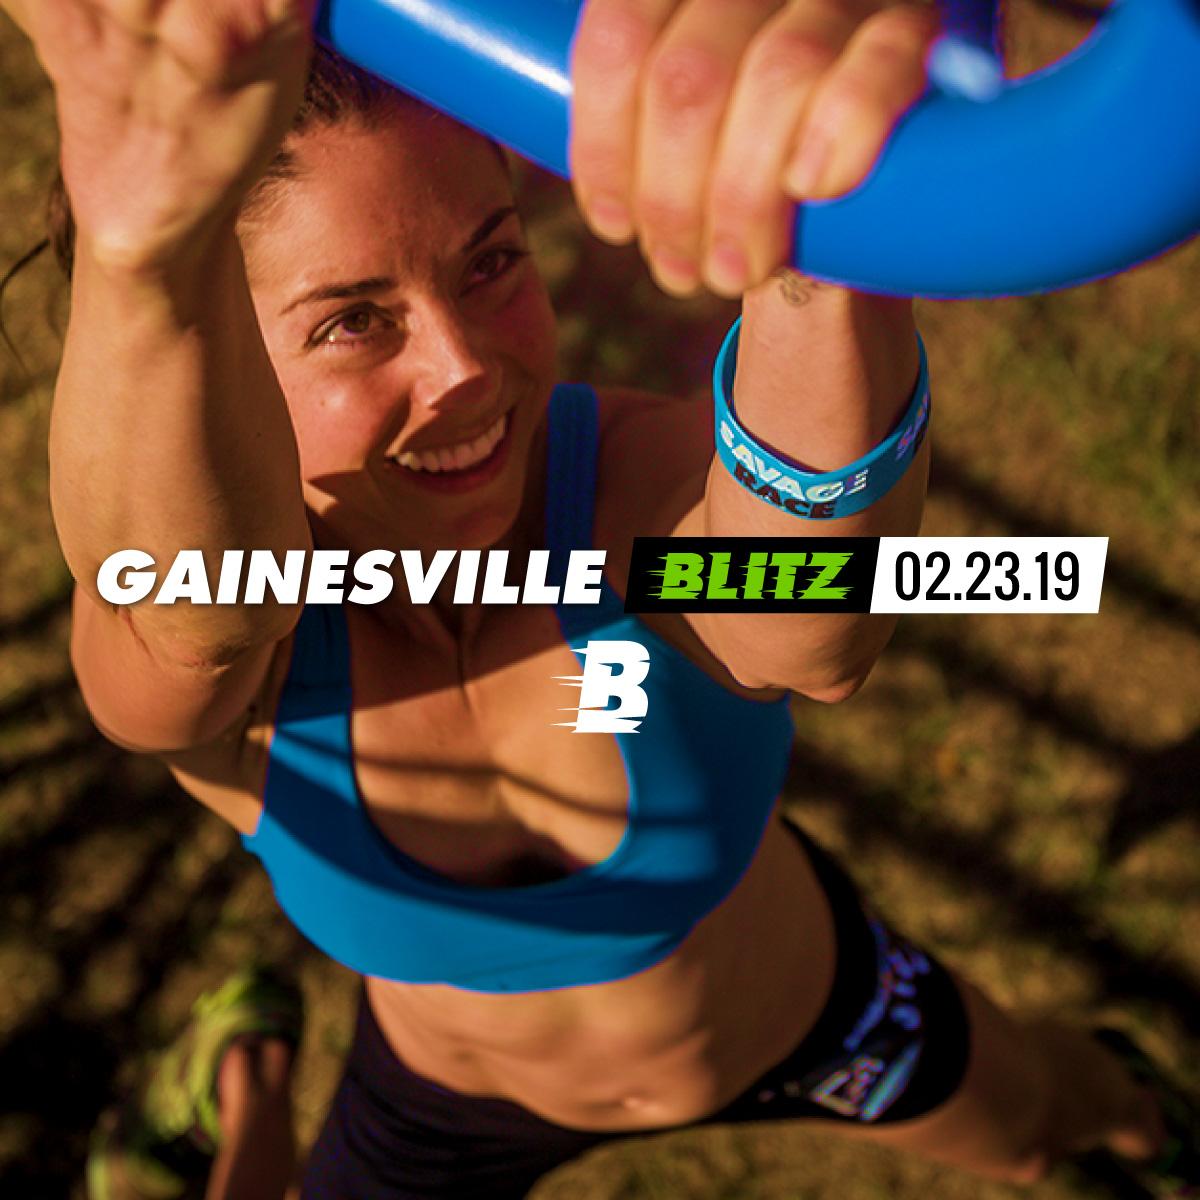 Spectator Pass - Savage Blitz Gainesville